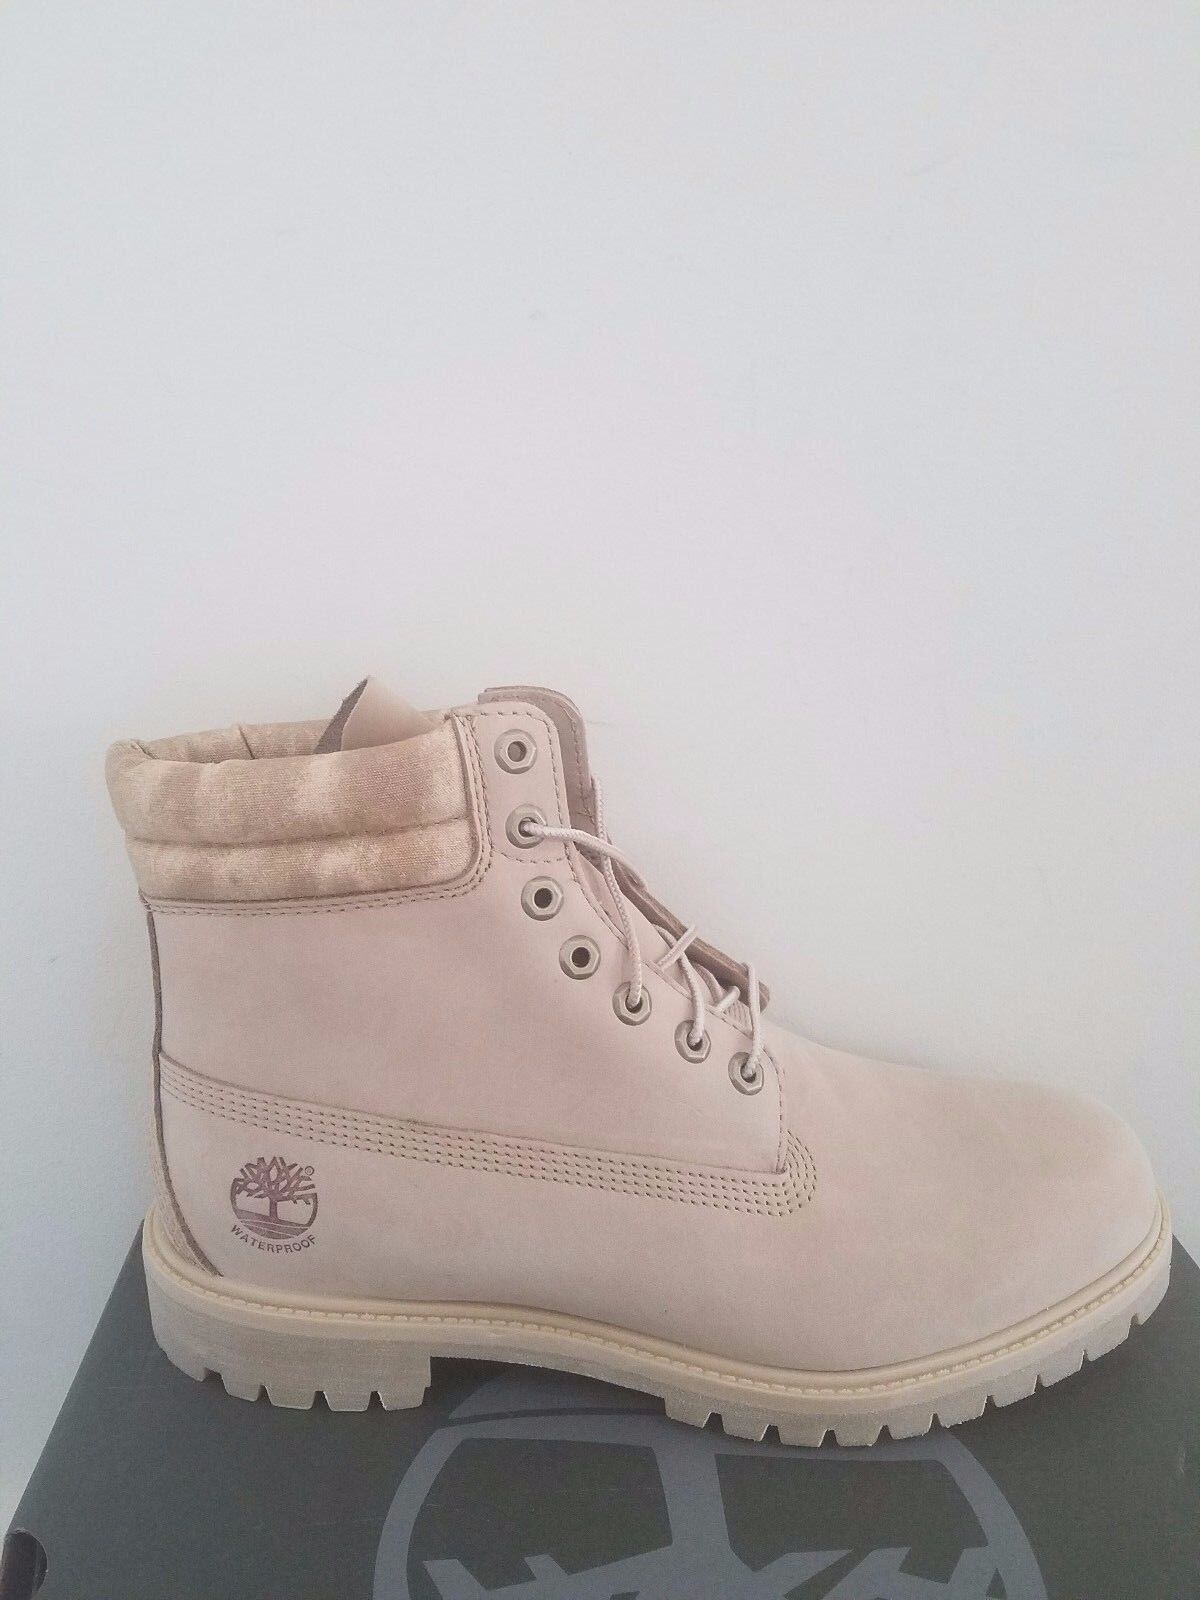 Timberland Men's 6-Inch Premium  Waterproof Tan Boots NIB